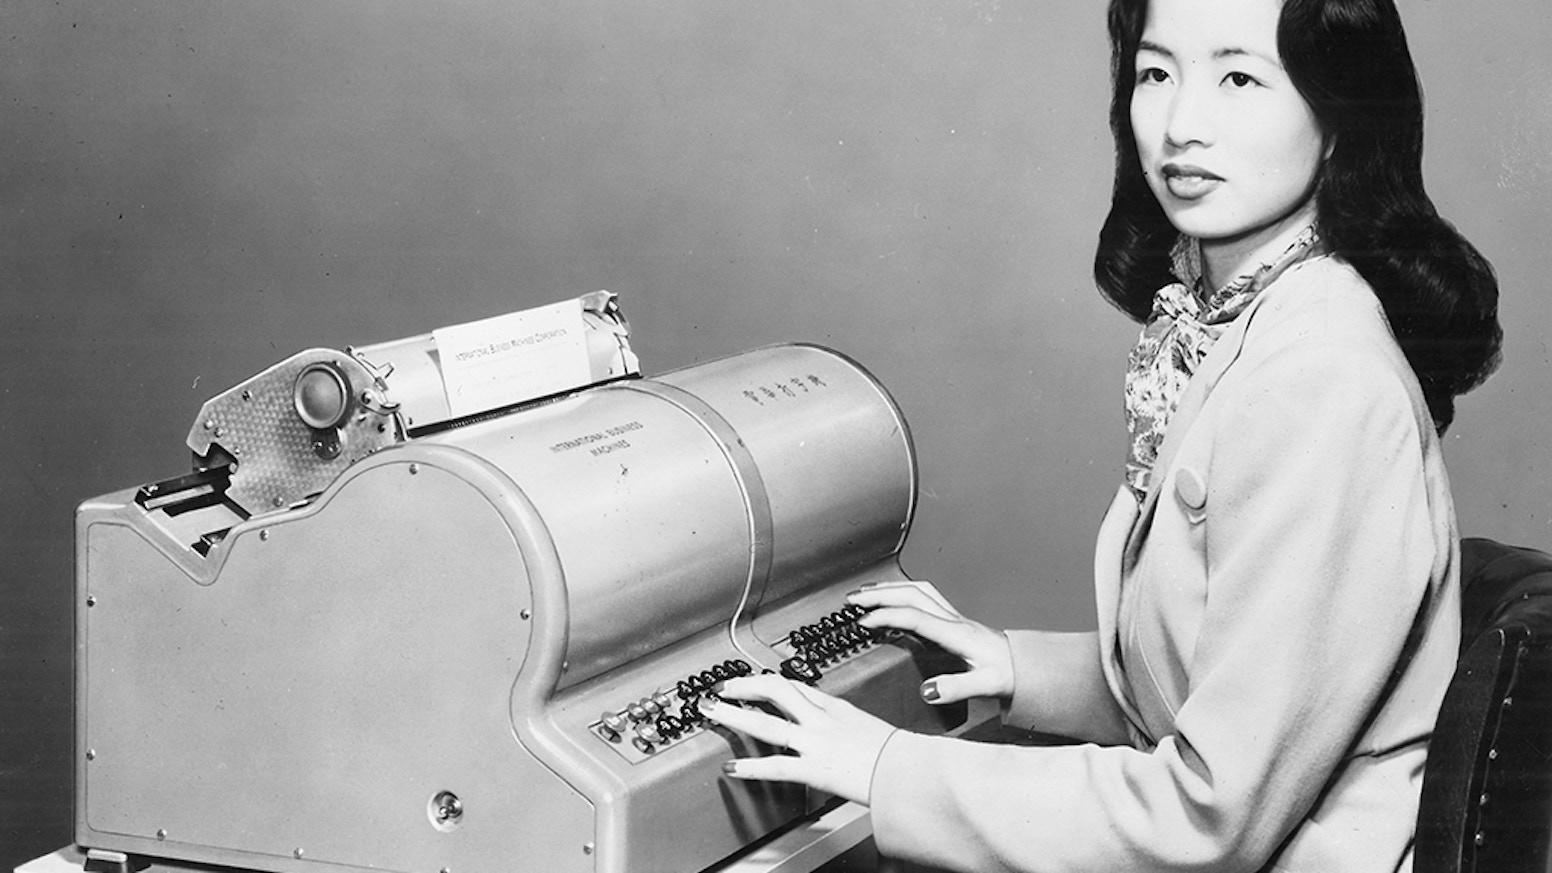 Bring the First-Ever Chinese Typewriter Museum Exhibition around the World! 盡管中文信息科技如此重要而龐大,在世上卻從來沒有過任何一家博物館有專門展出過這人類科技史上關鍵的一章,直到今天!